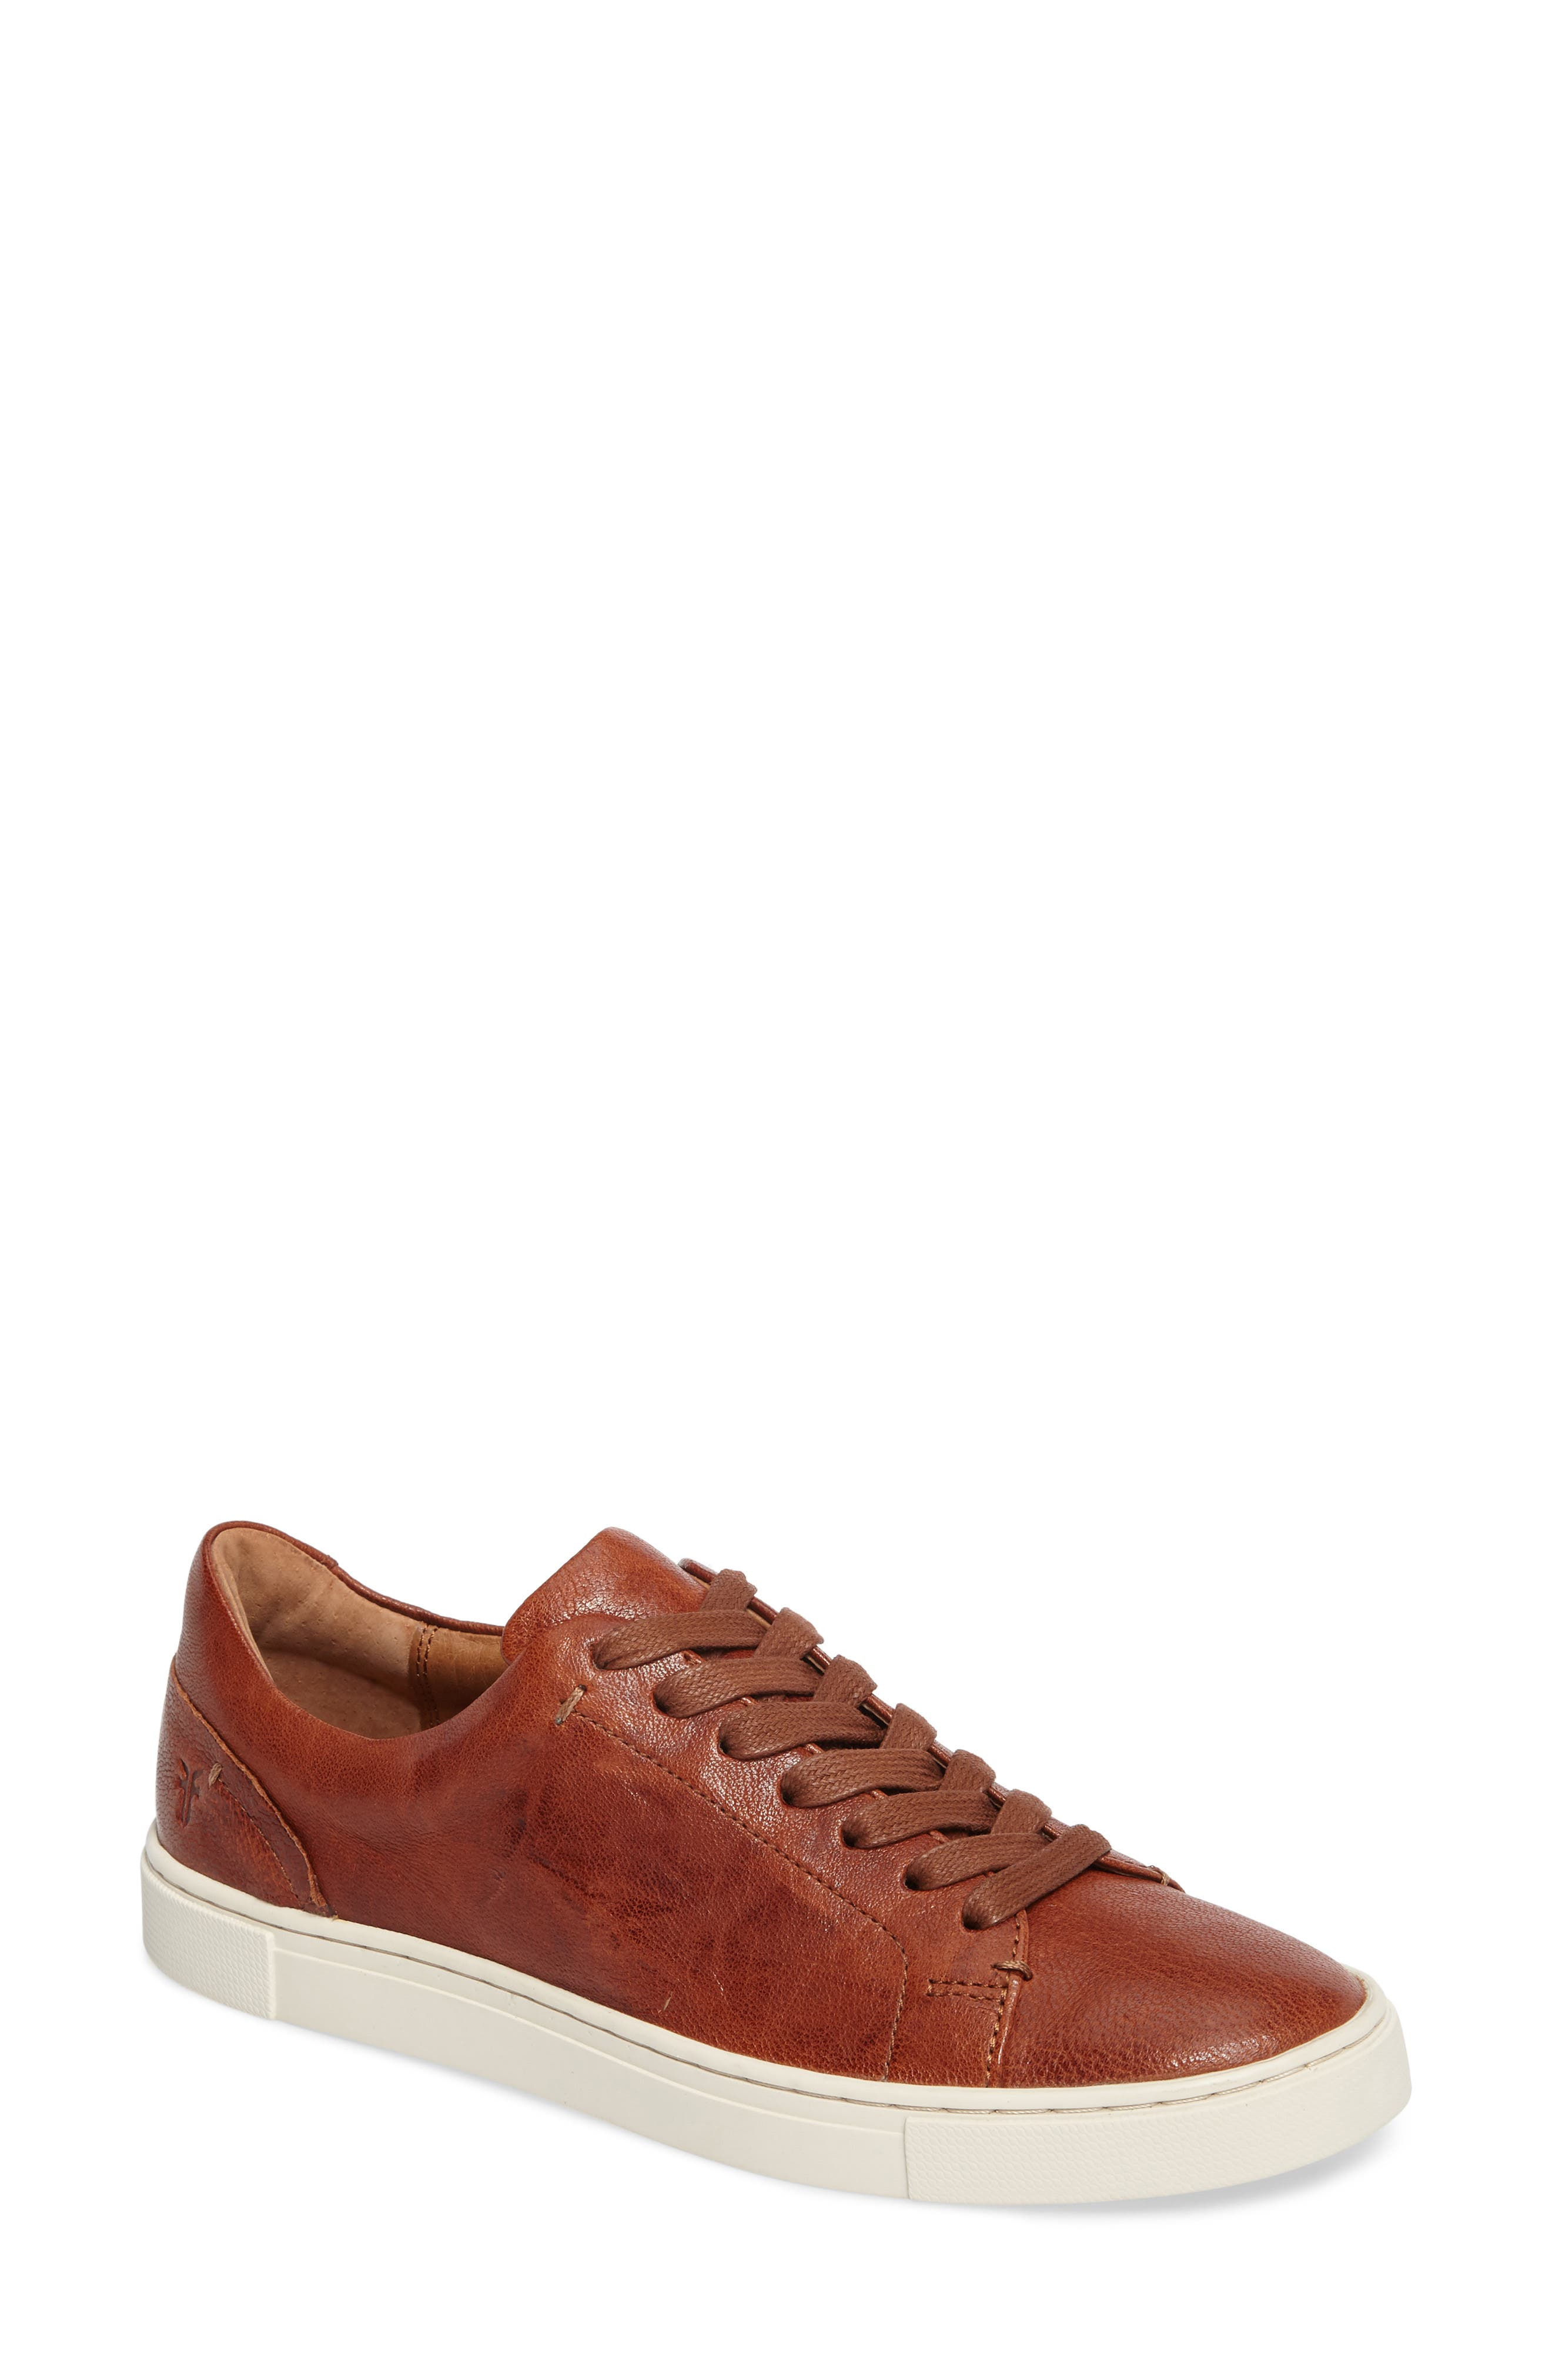 Ivy Sneaker,                         Main,                         color, 235